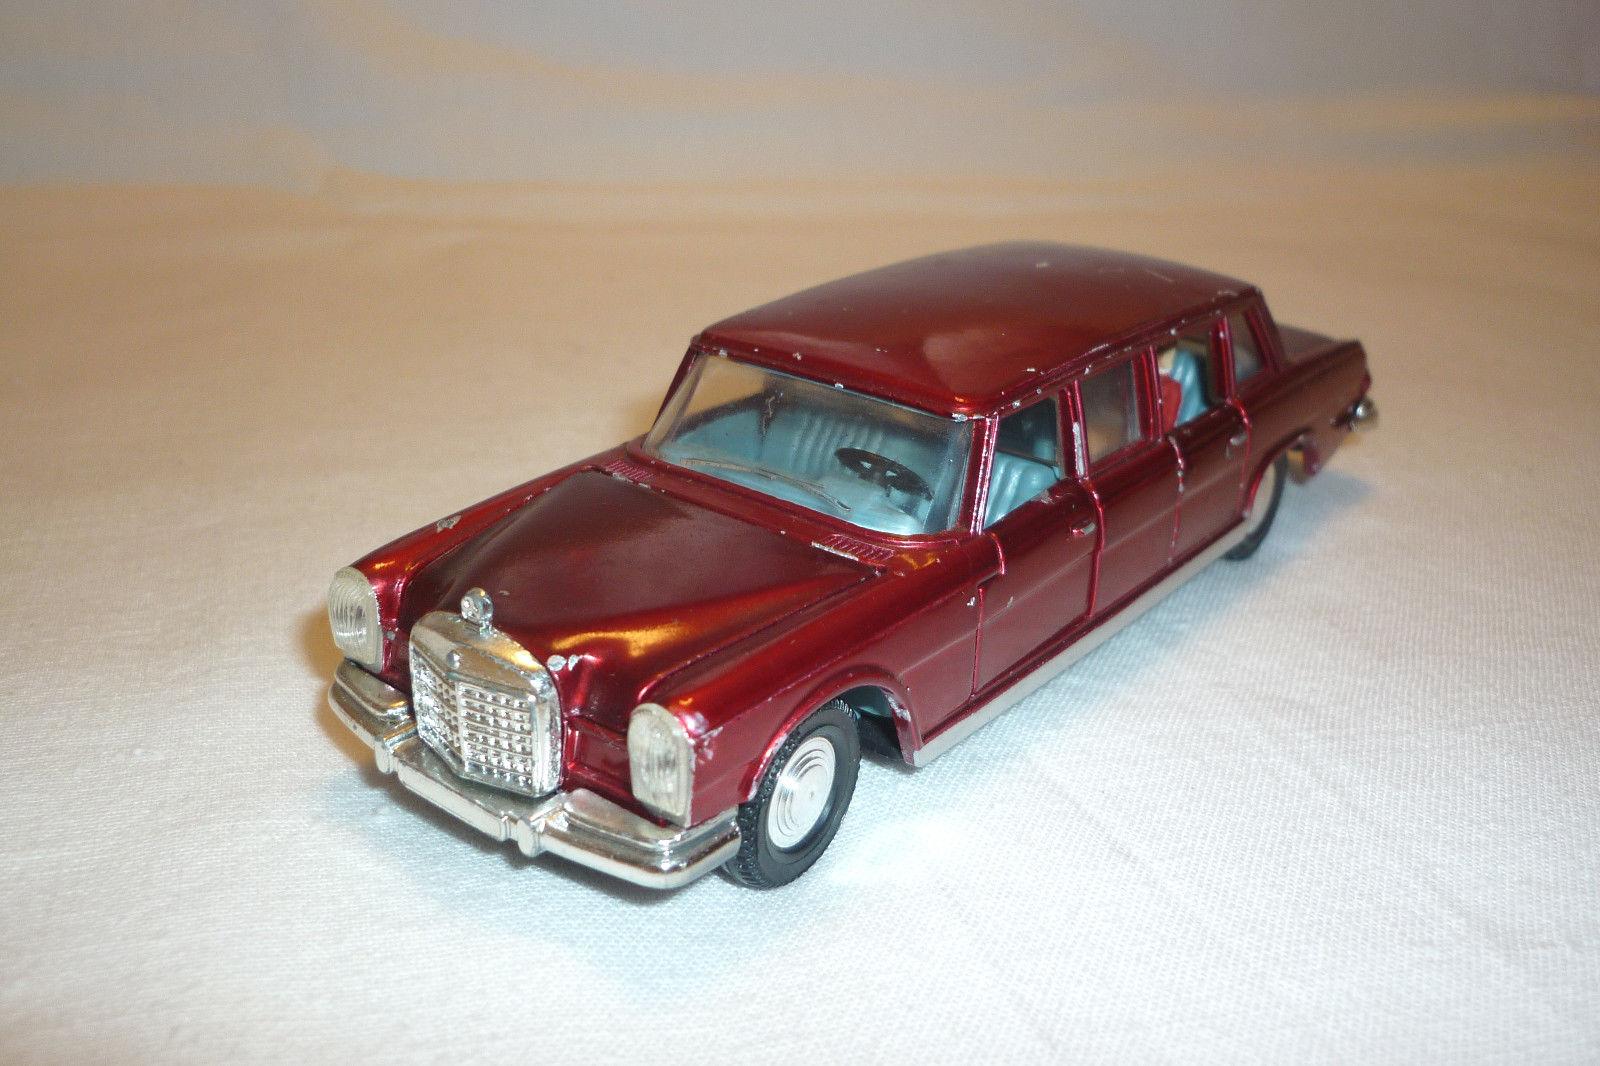 Dinky Toys - Vintage Modello in Metallo-Mercedes-Benz 600 - No